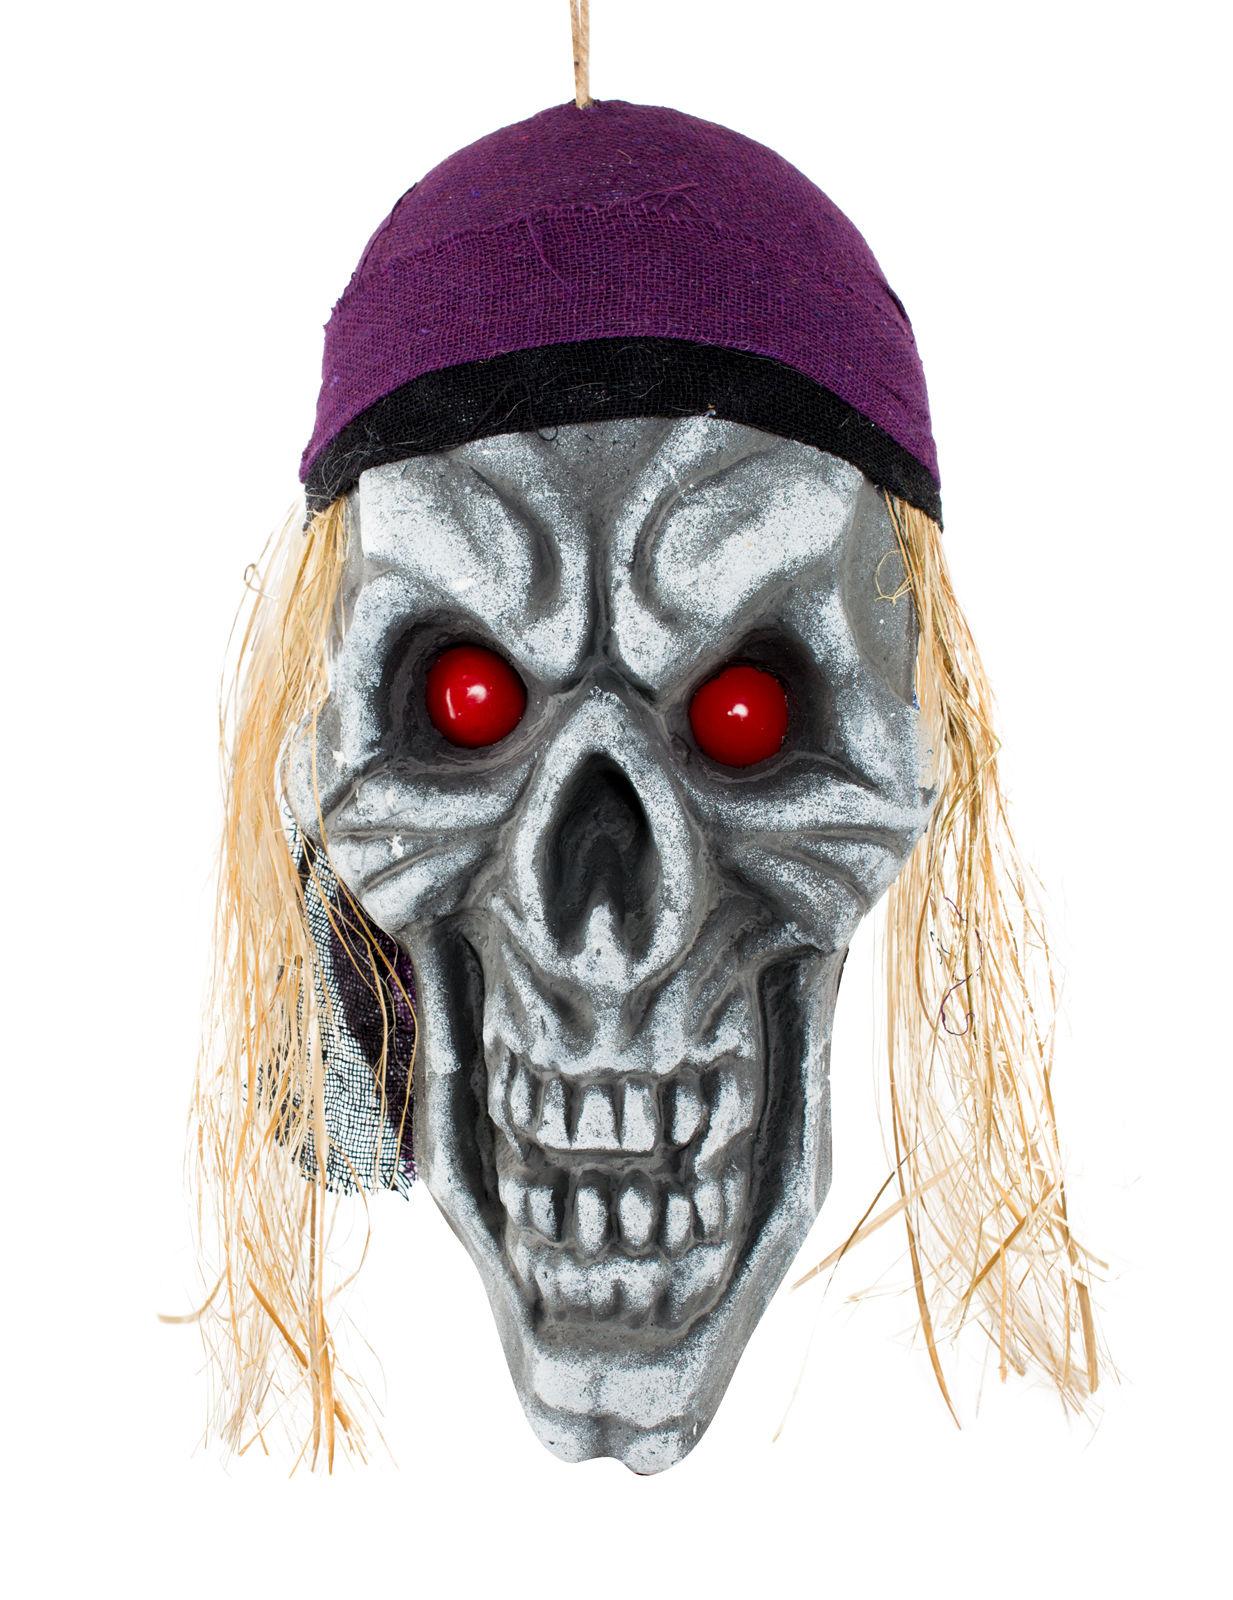 Piraten totensch del halloween deko totenkopf grau lila for Wohnzimmer deko rot grau